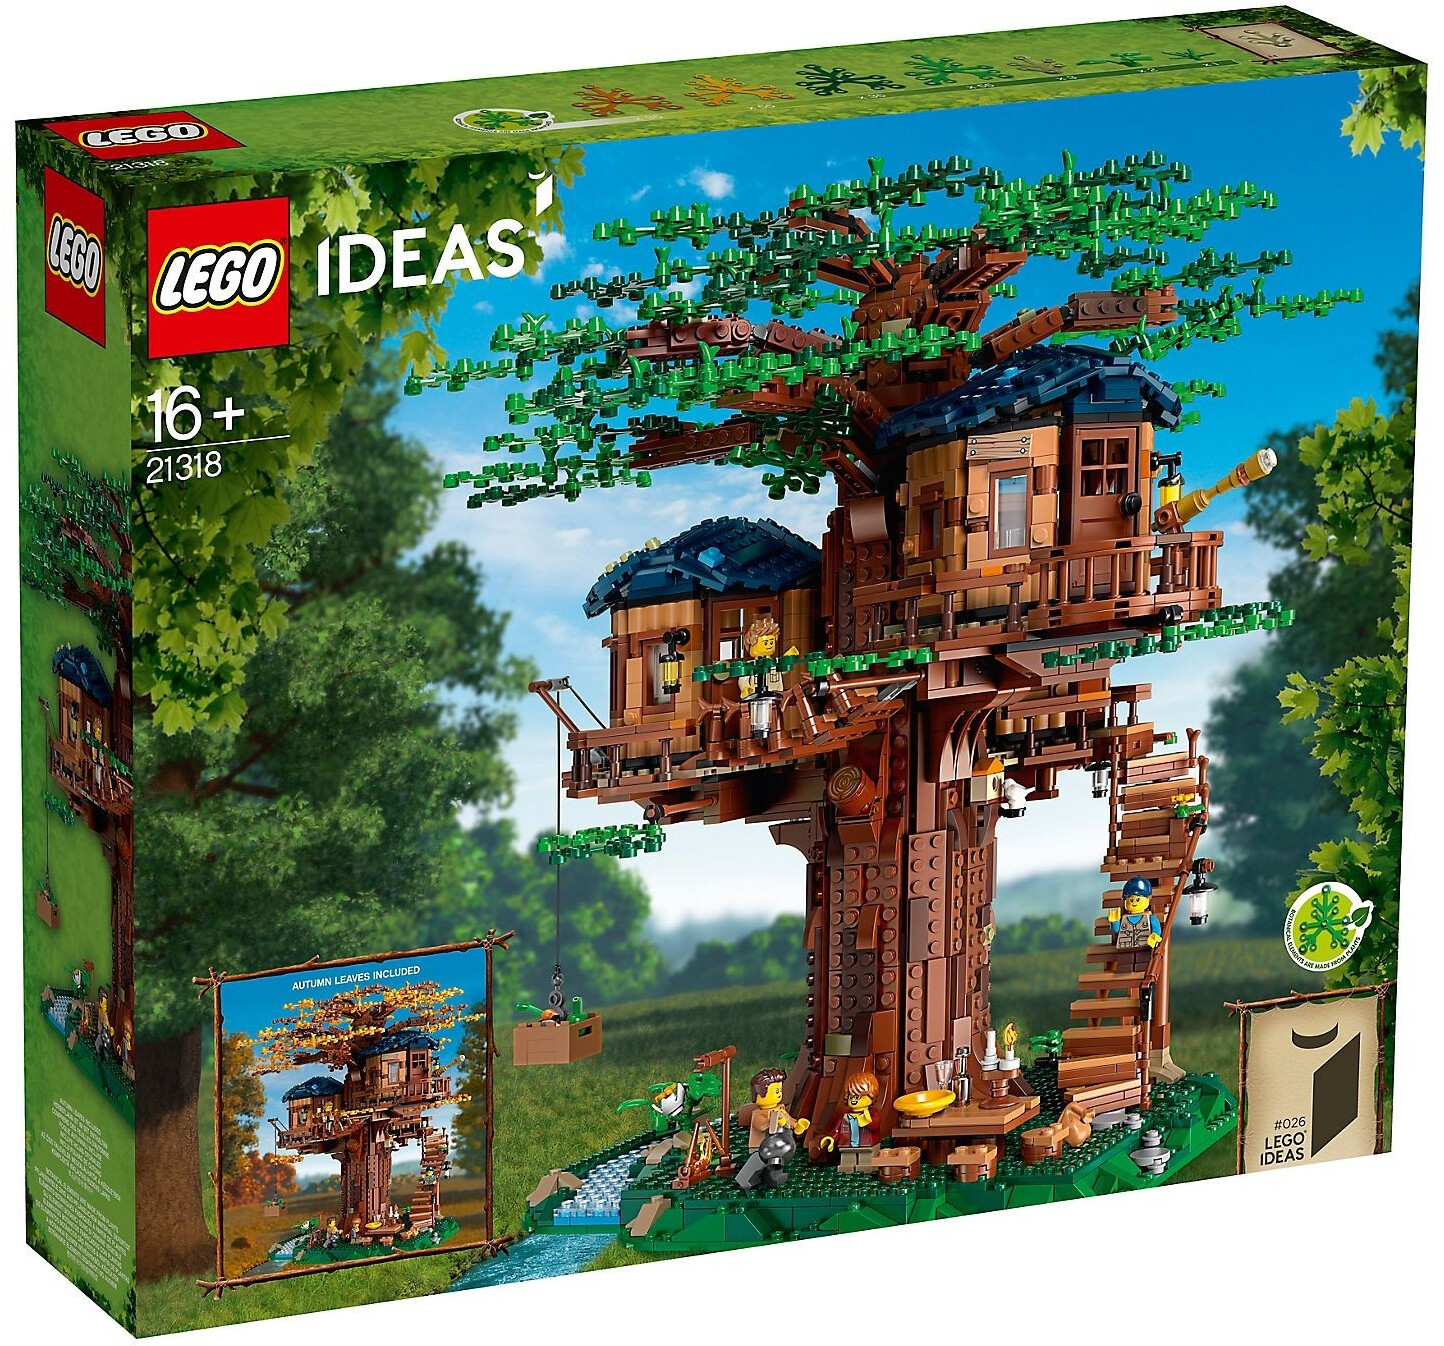 LEGO Ideas - Baumhaus (21318)